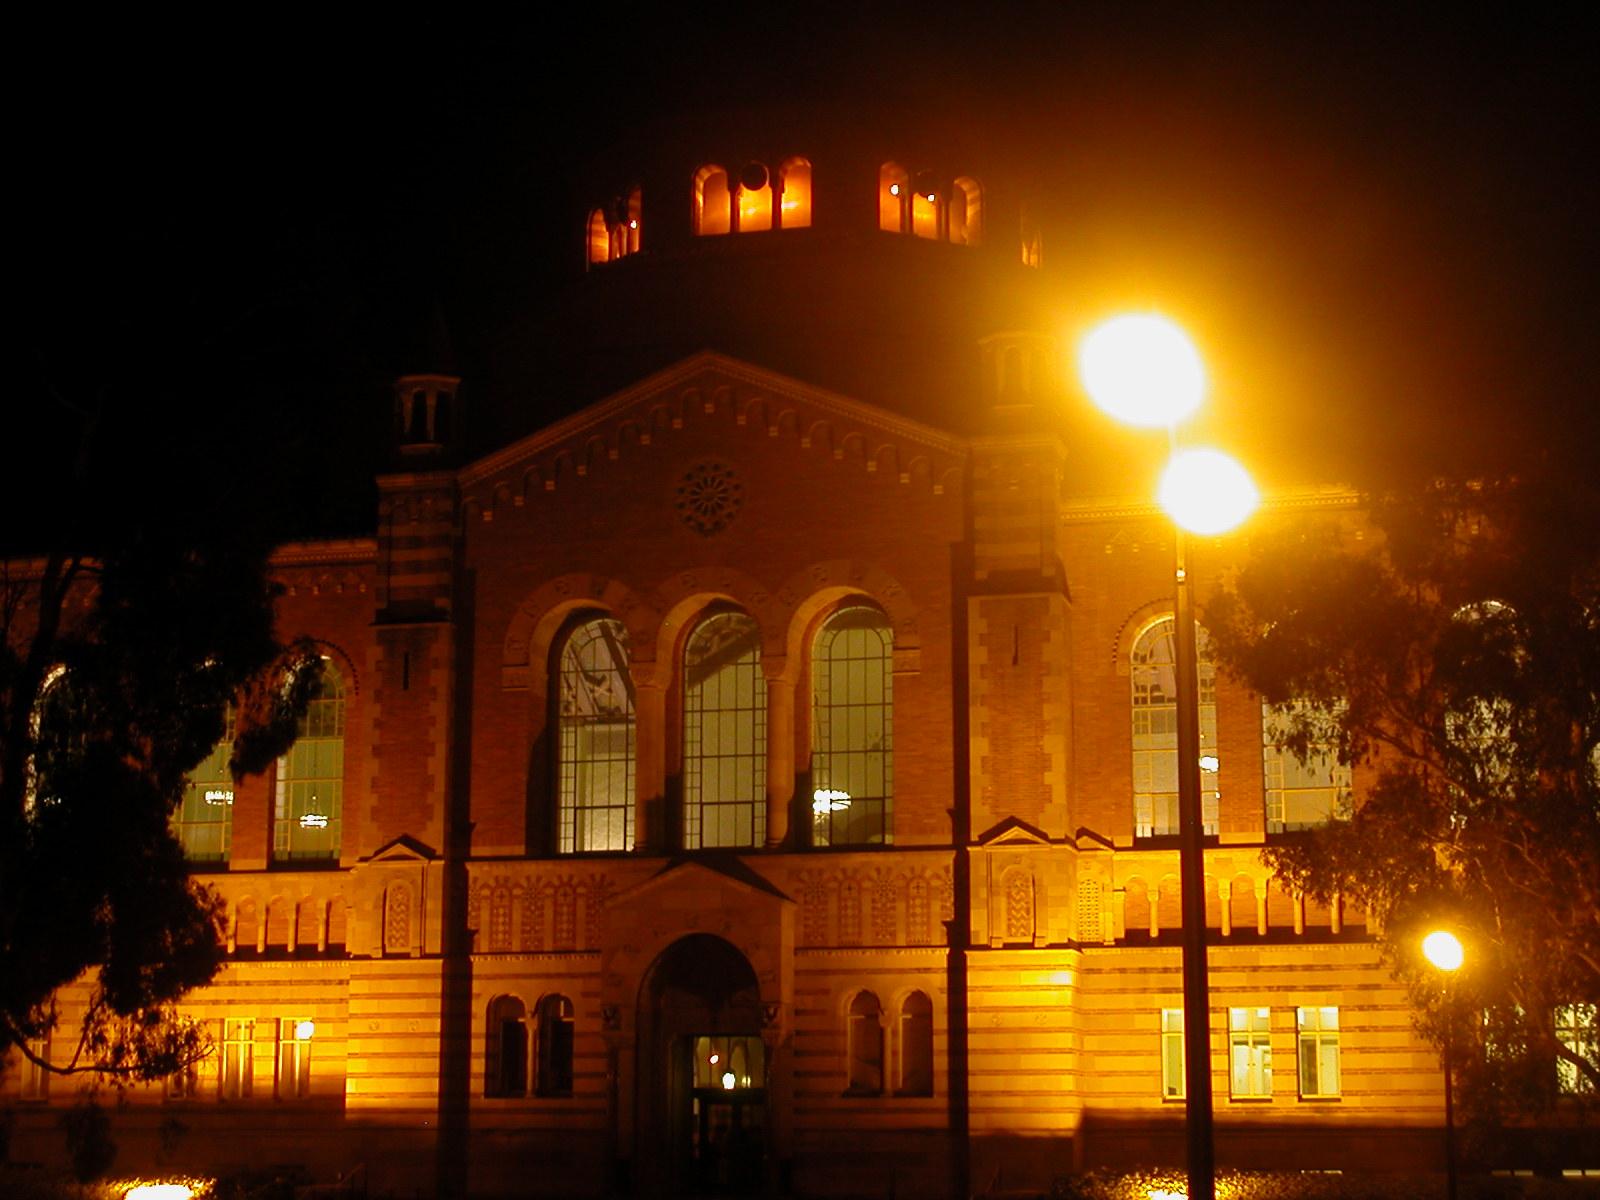 ucla campus at night - photo #1